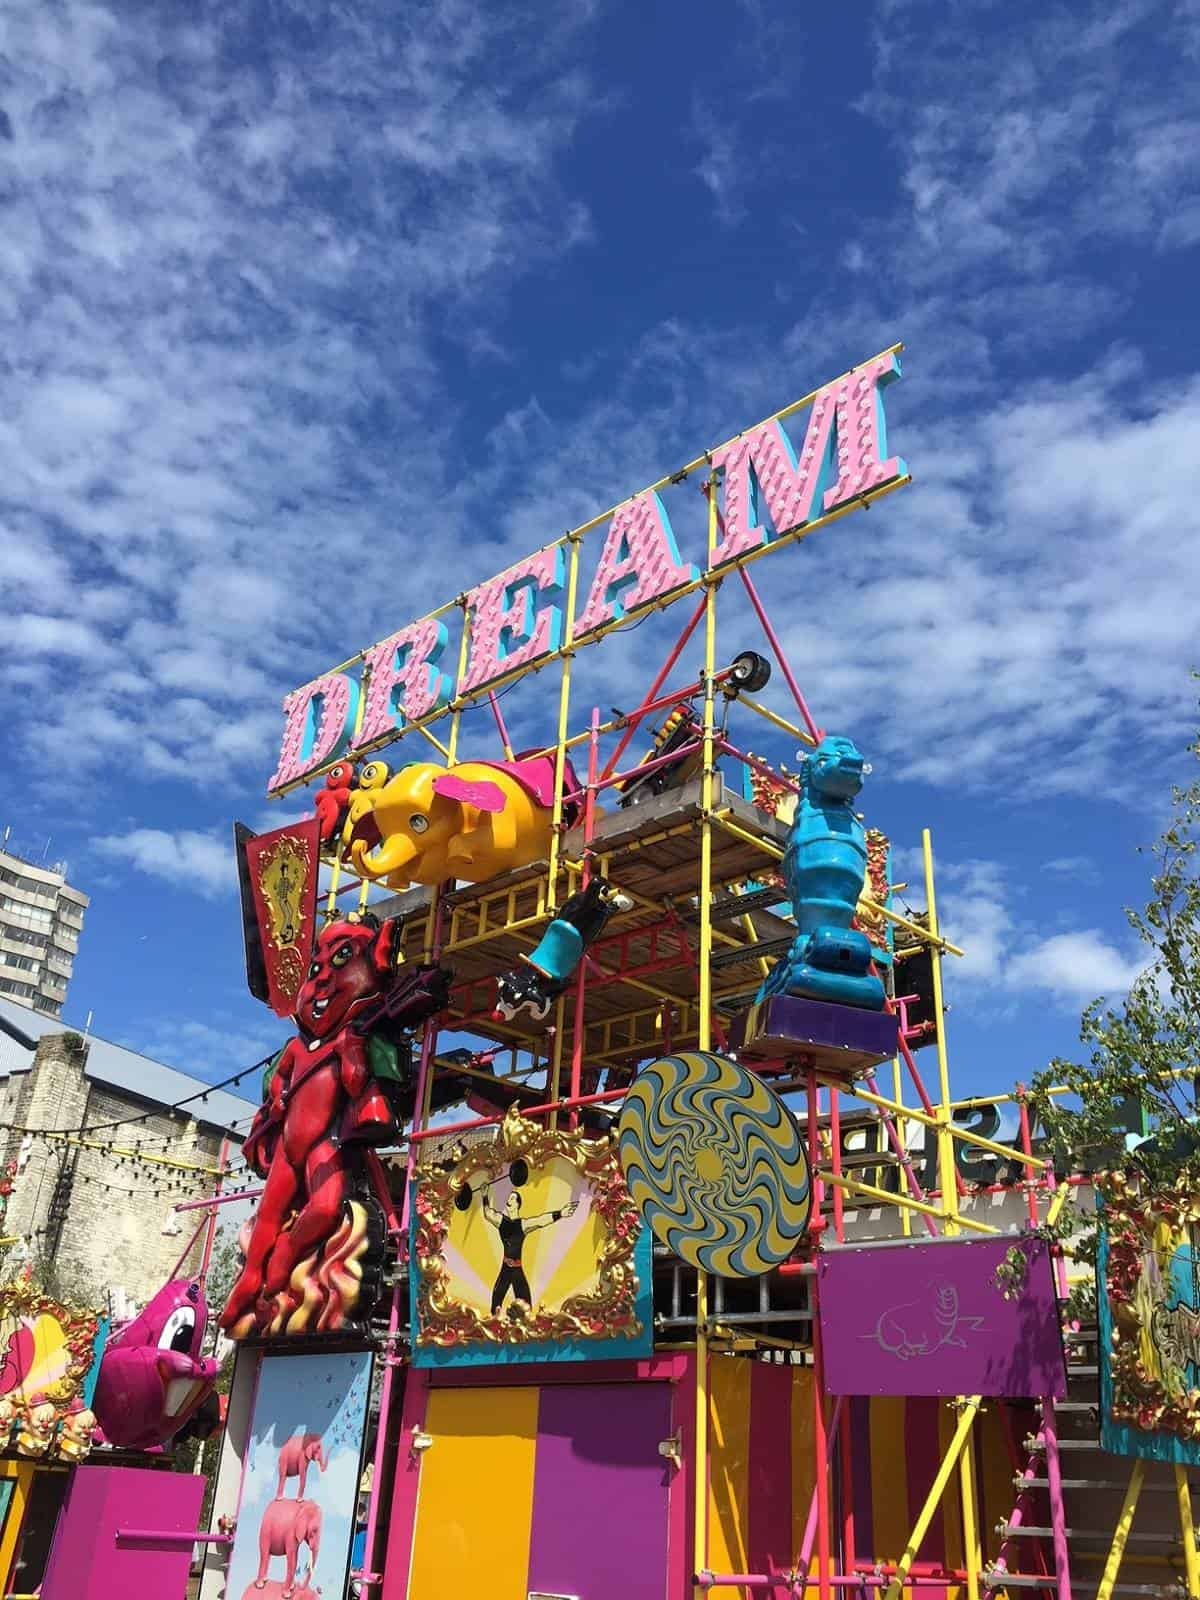 Dreamland in Margate